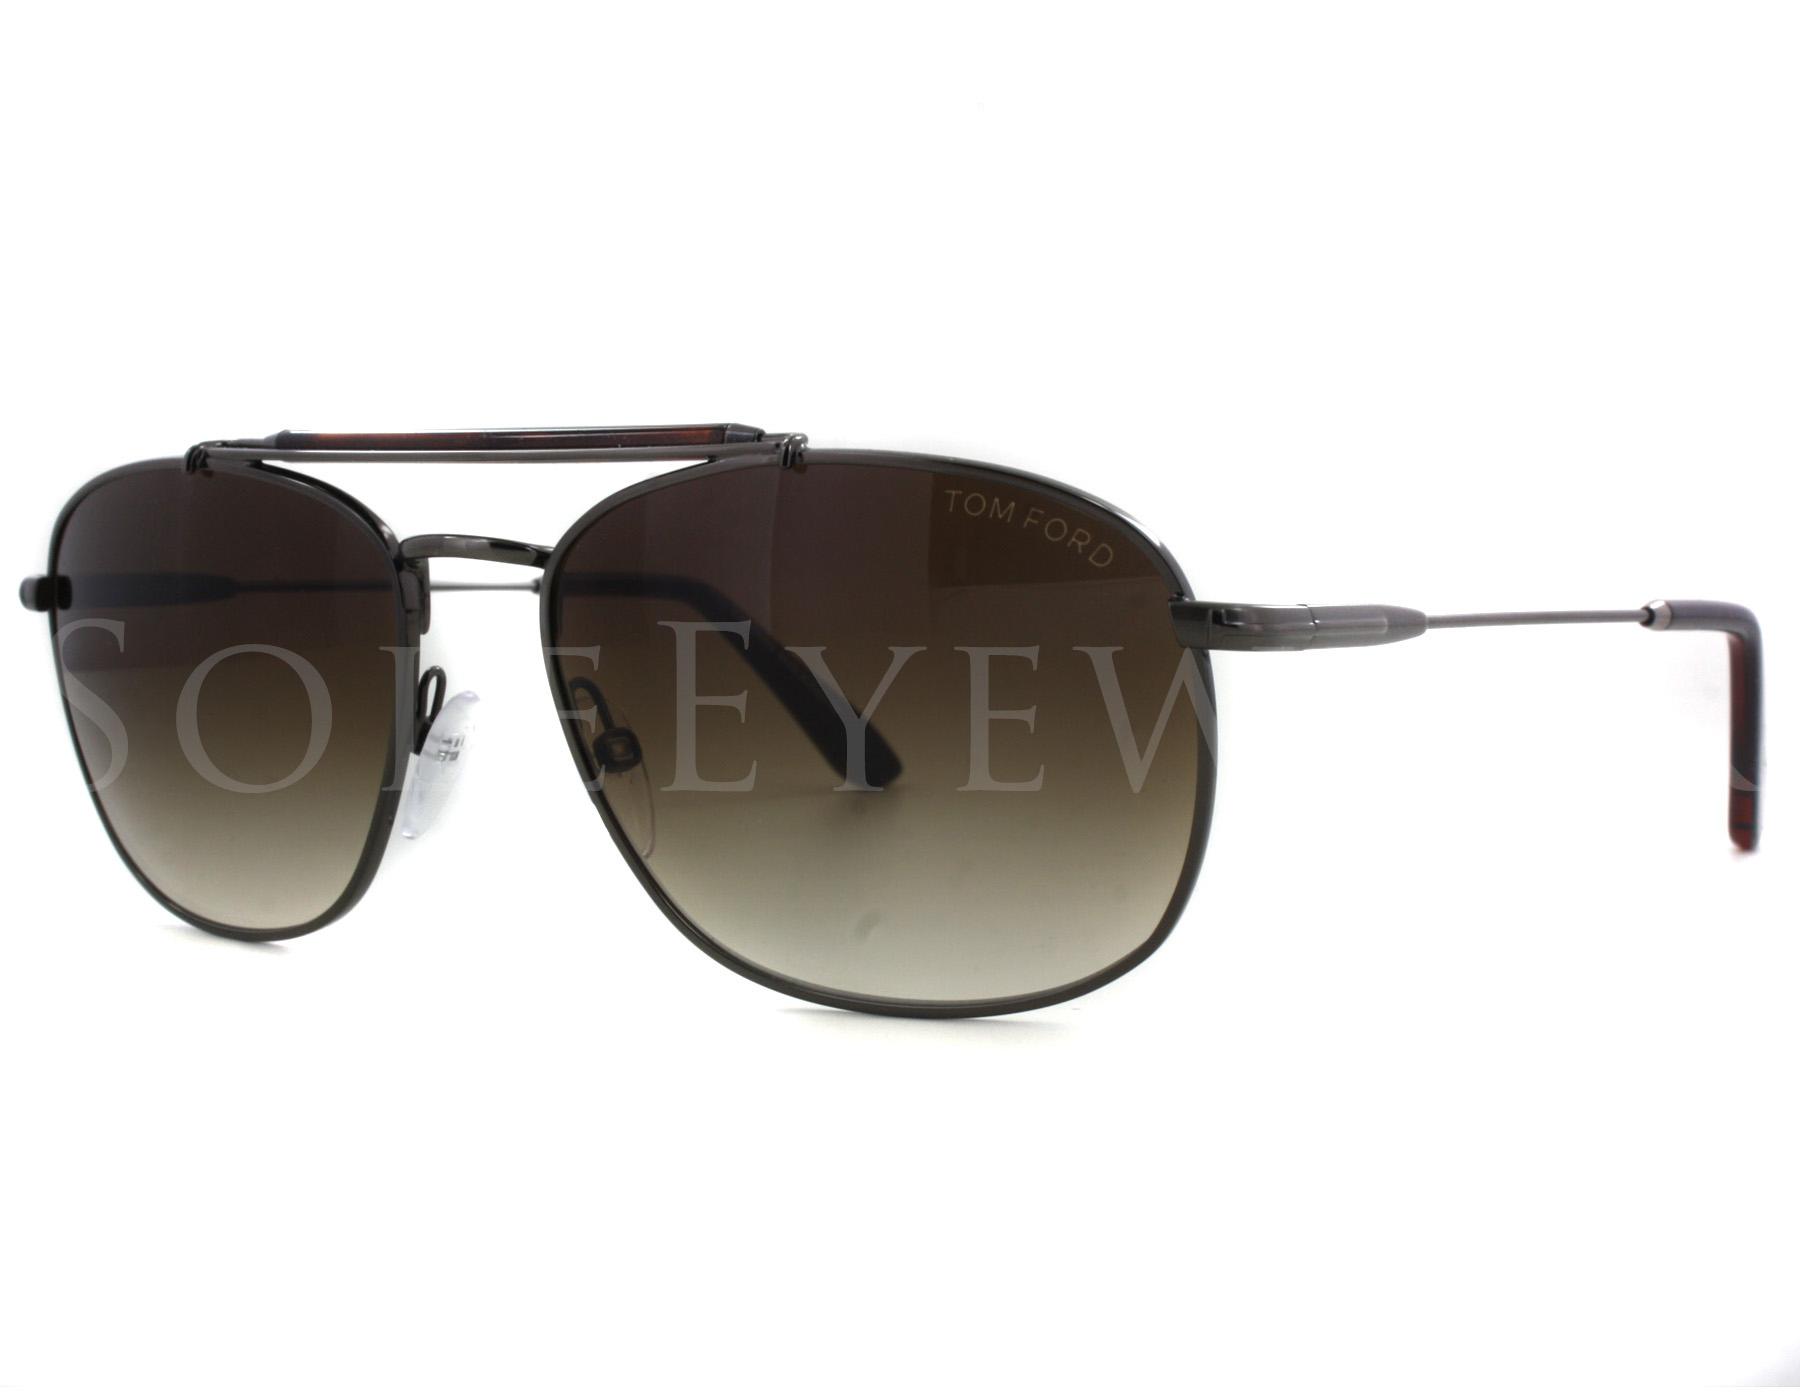 0e592273bd0ca Details about NEW Tom Ford FT0339-09F Marlon Ruthenium Havana Grey Green  Sunglasses (NO CASE)